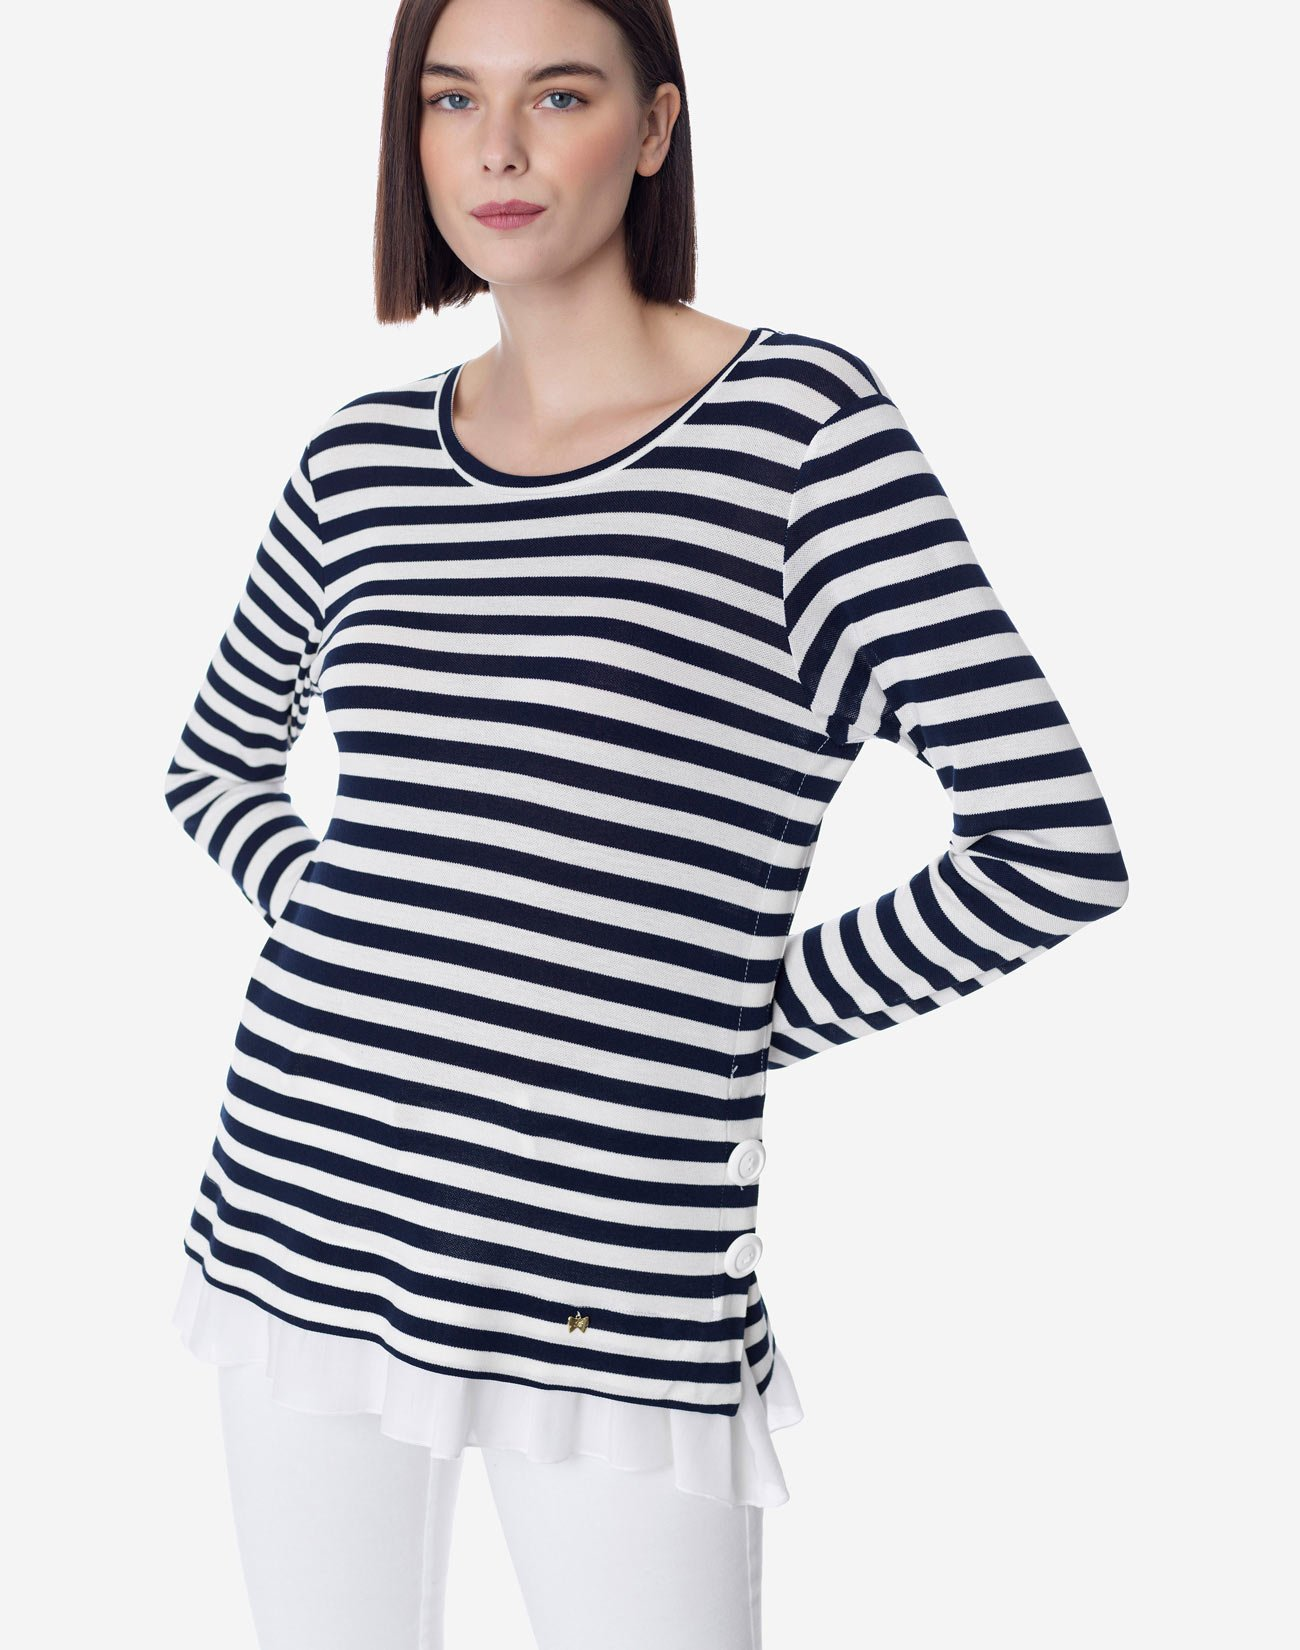 Striped top with ruffle hem